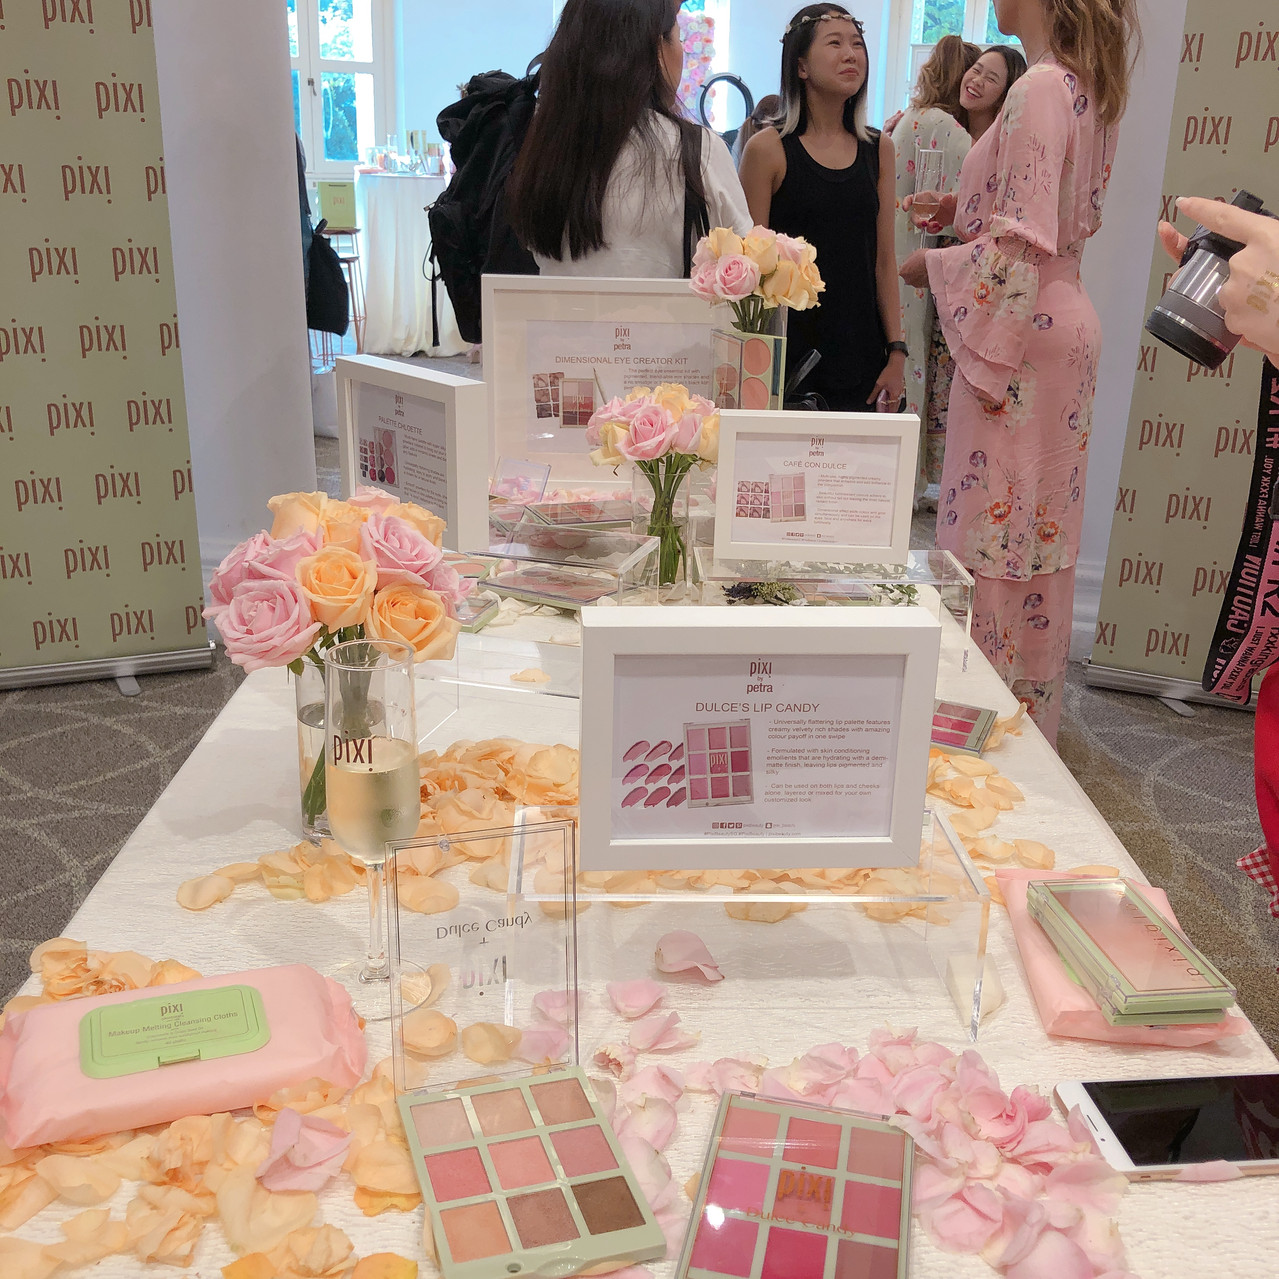 pixi beauty launch